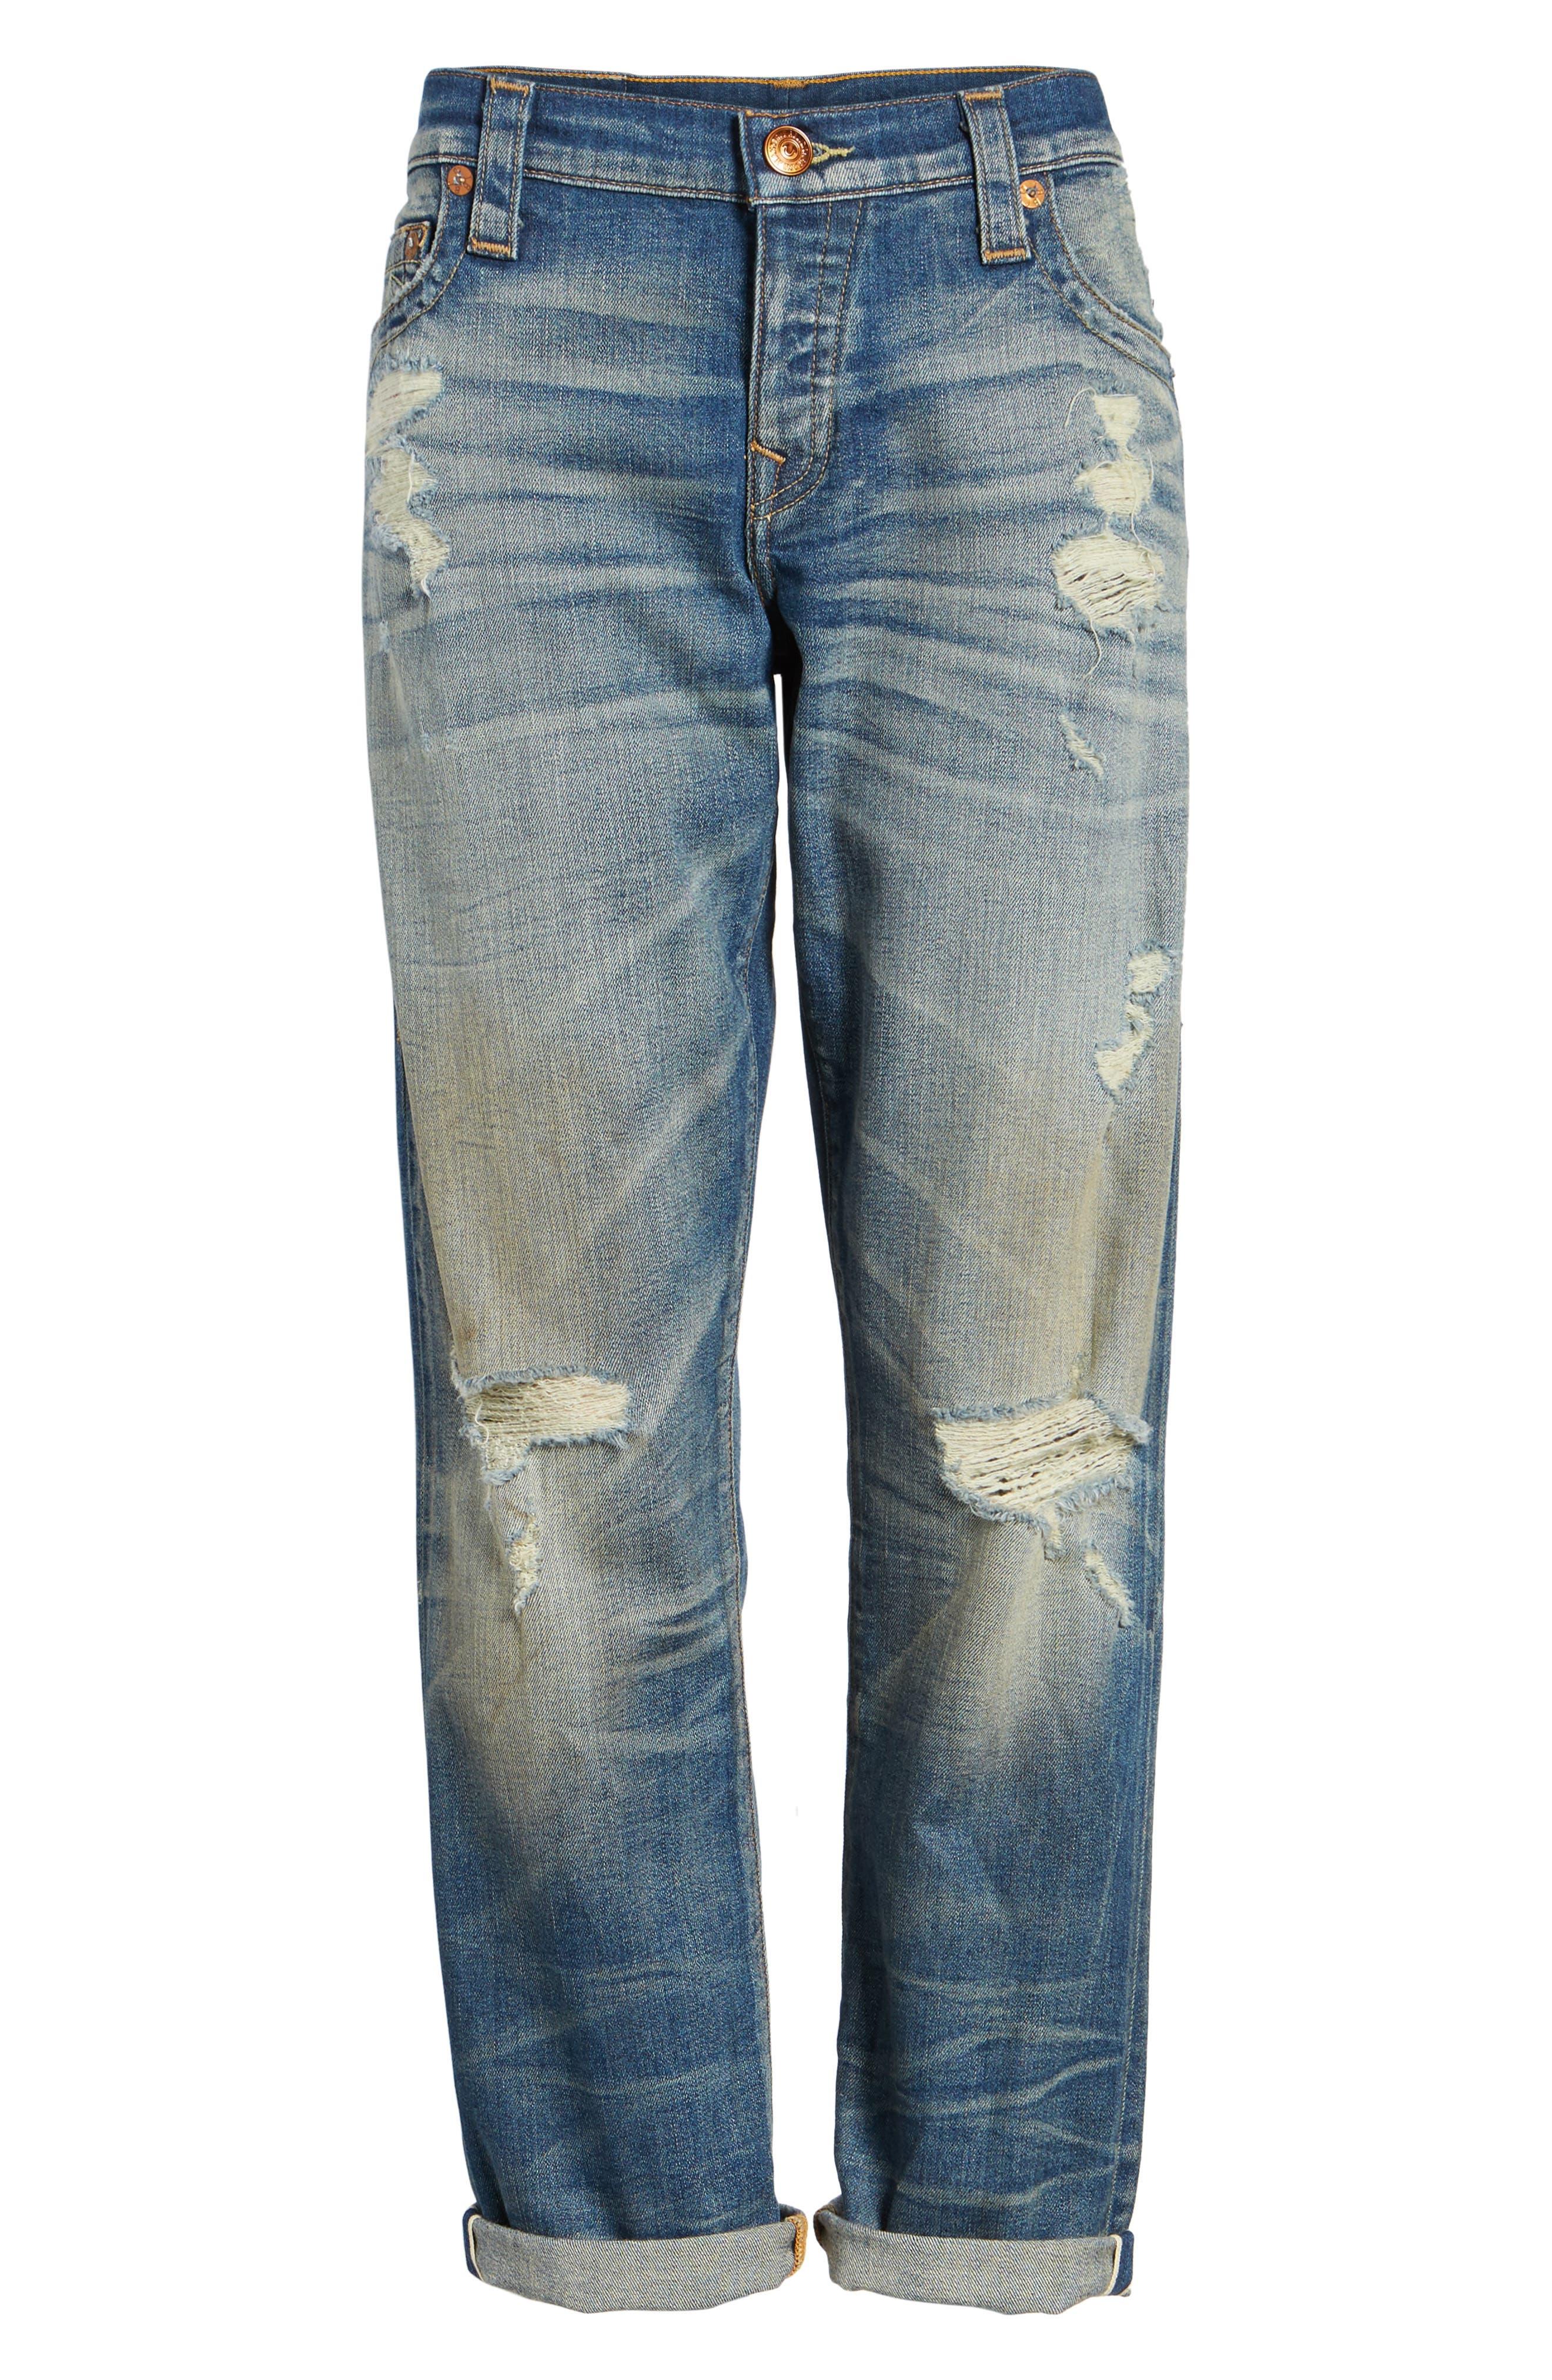 Cameron Slim Boyfriend Jeans,                             Alternate thumbnail 8, color,                             Indigo Legacy